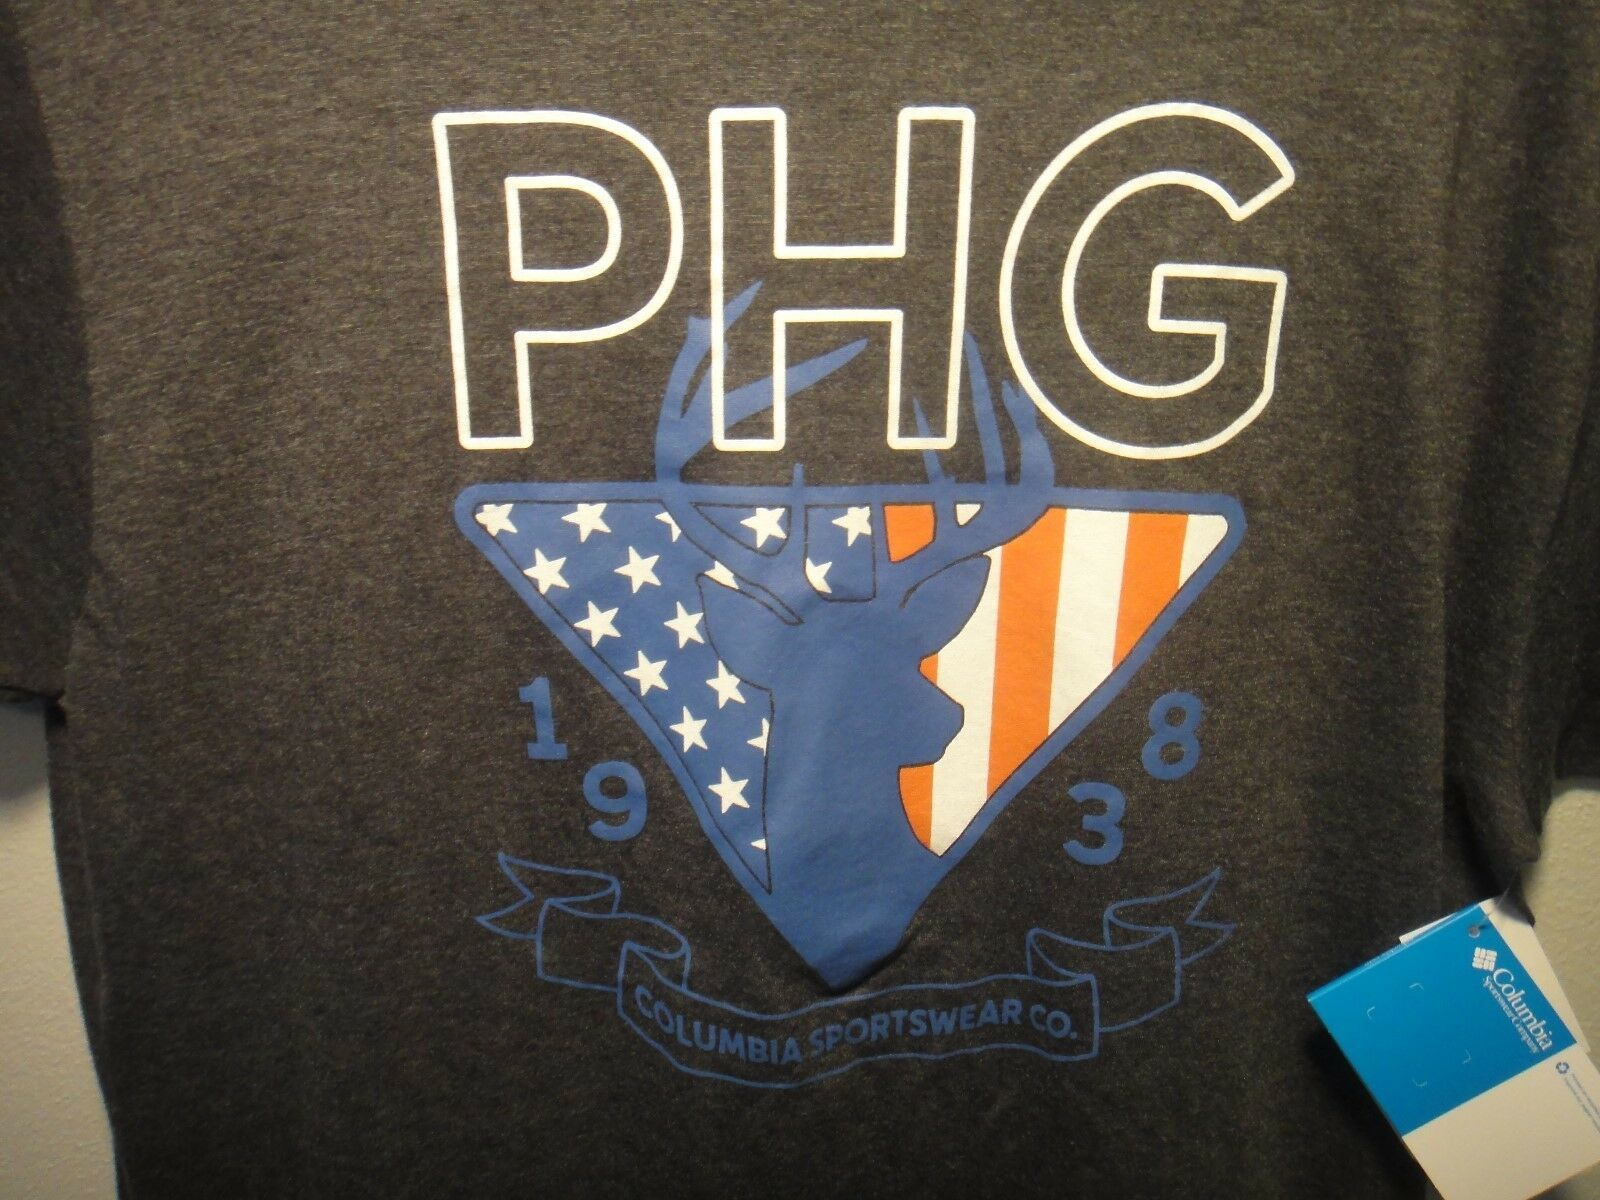 Columbia Sportswear Company PHG Deer Red White Blue Short Sleeve Shirt Size L - $16.79